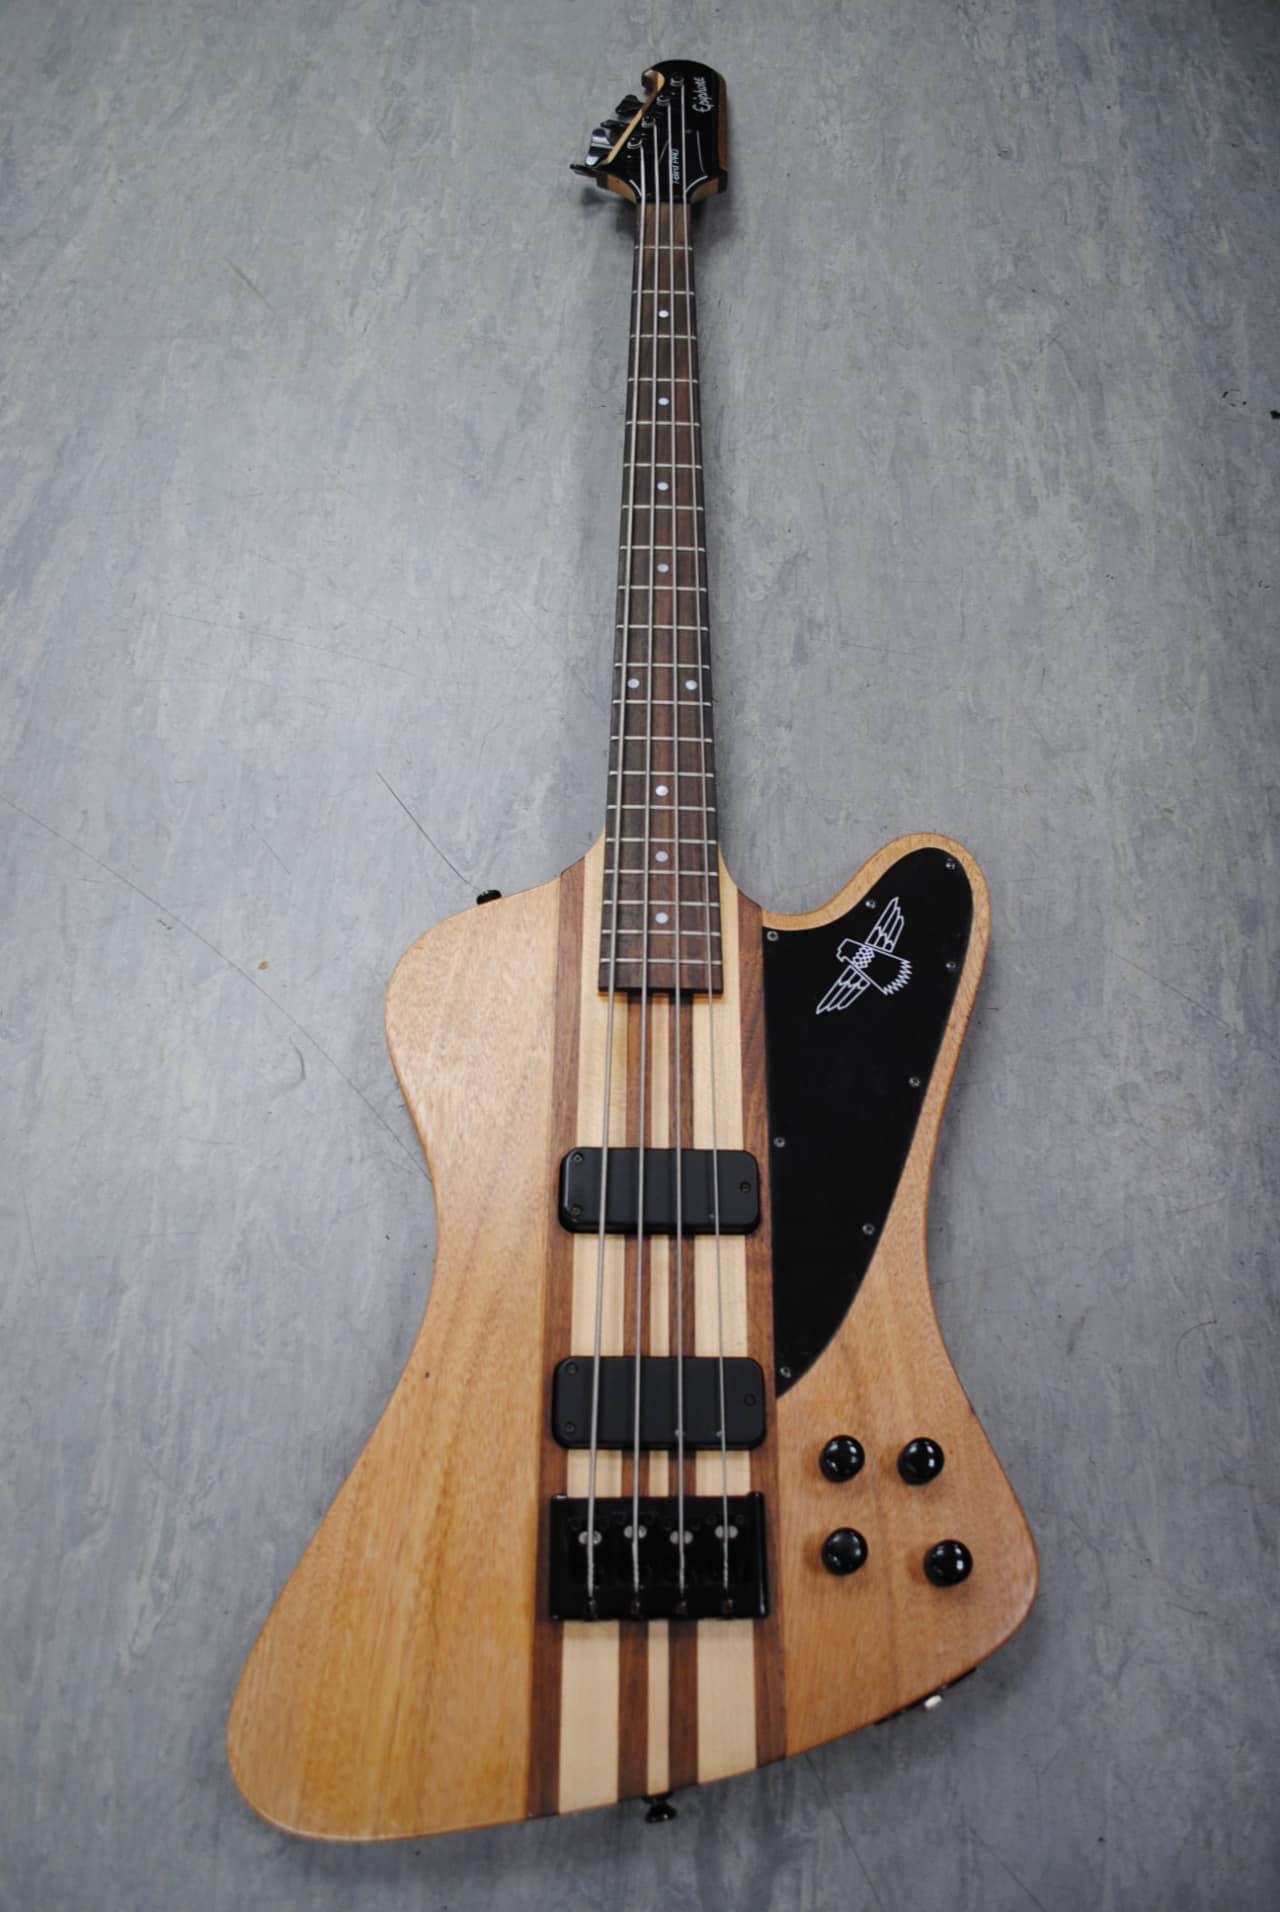 epiphone thunderbird pro iv bass guitar reverb. Black Bedroom Furniture Sets. Home Design Ideas